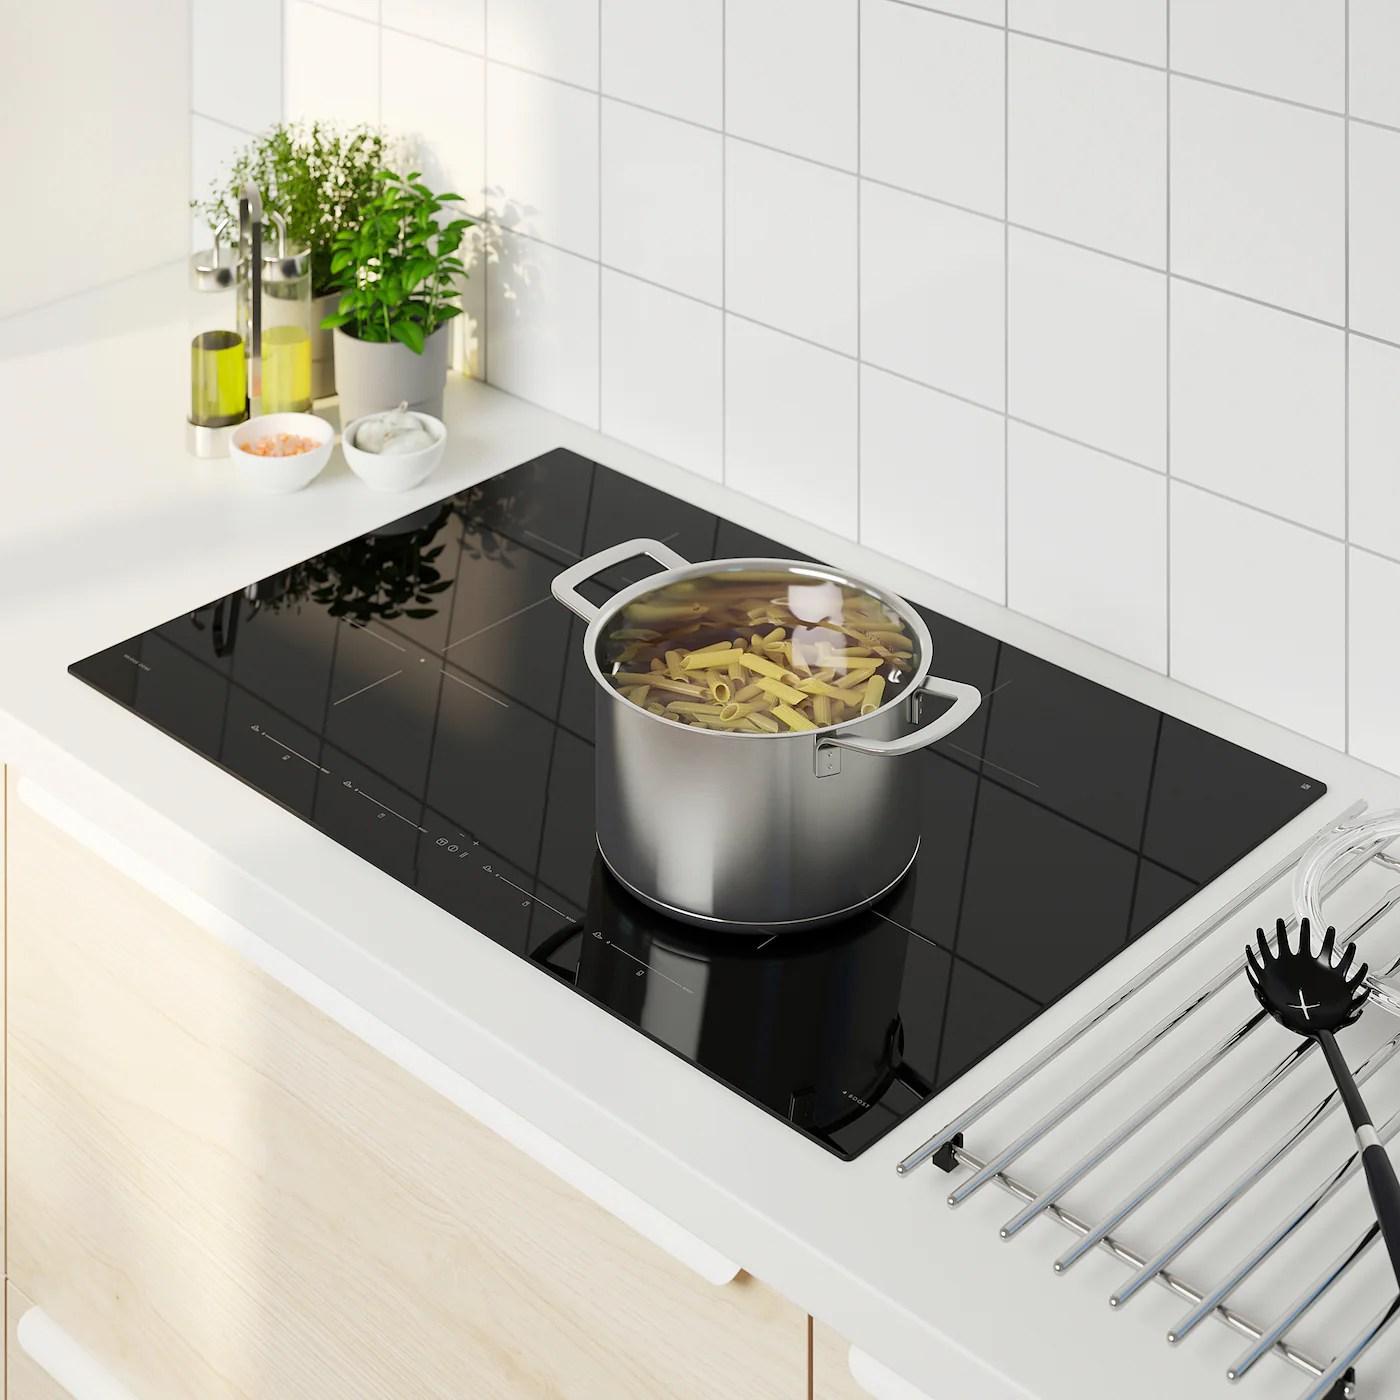 utnamnd table de cuisson induction ikea 500 noir 78 cm